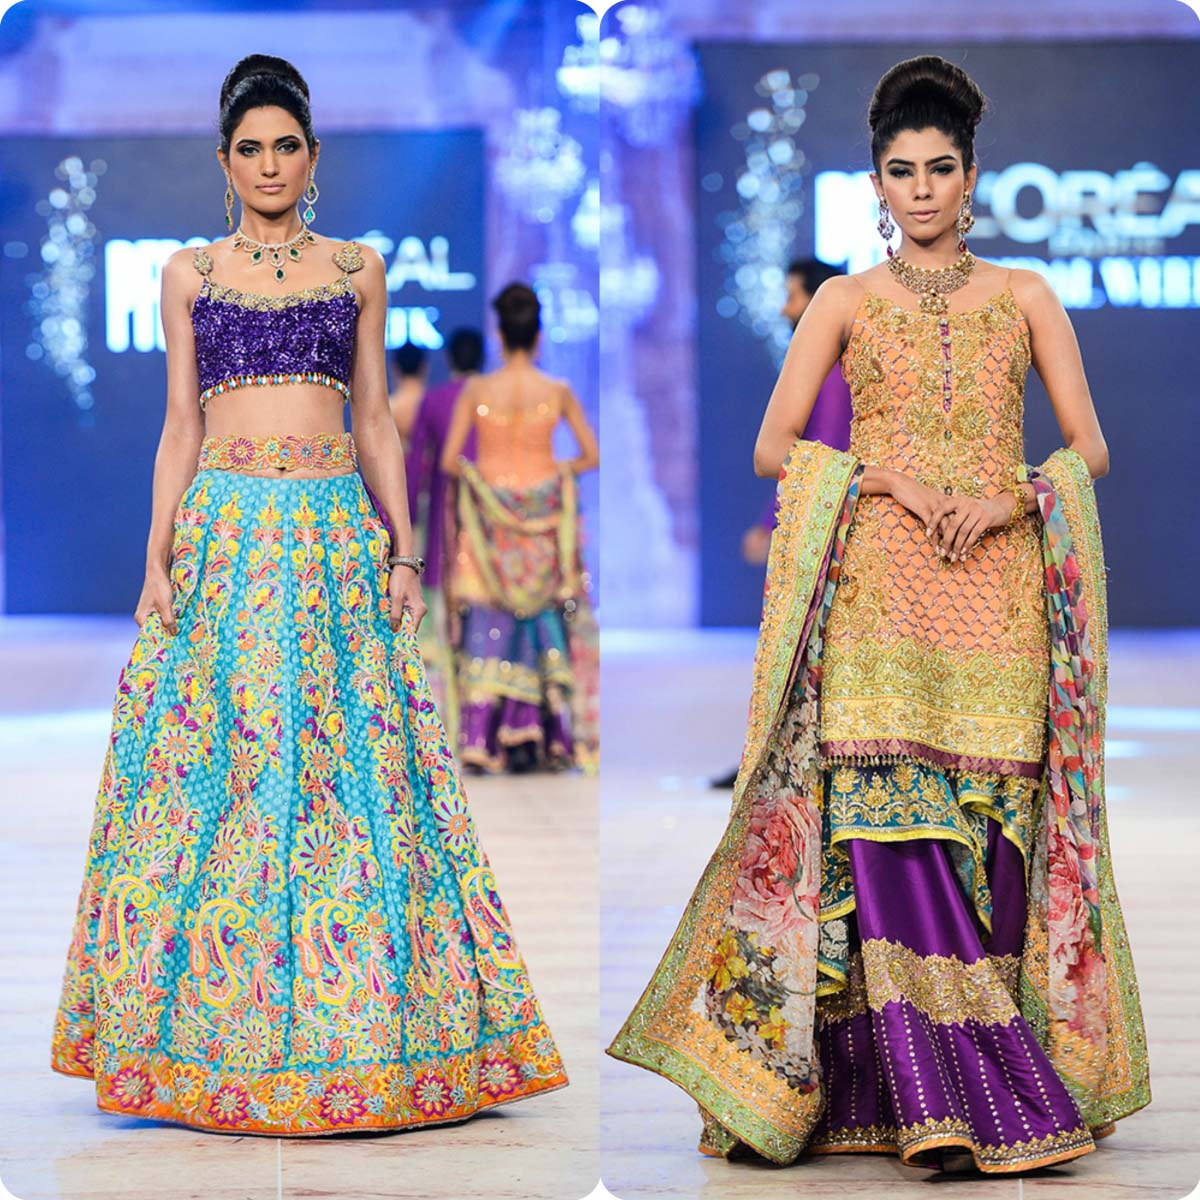 Nomi Ansari Bridal Wear Collection Ft-Junaid Khan & Maya Ali 2016-17 (4)